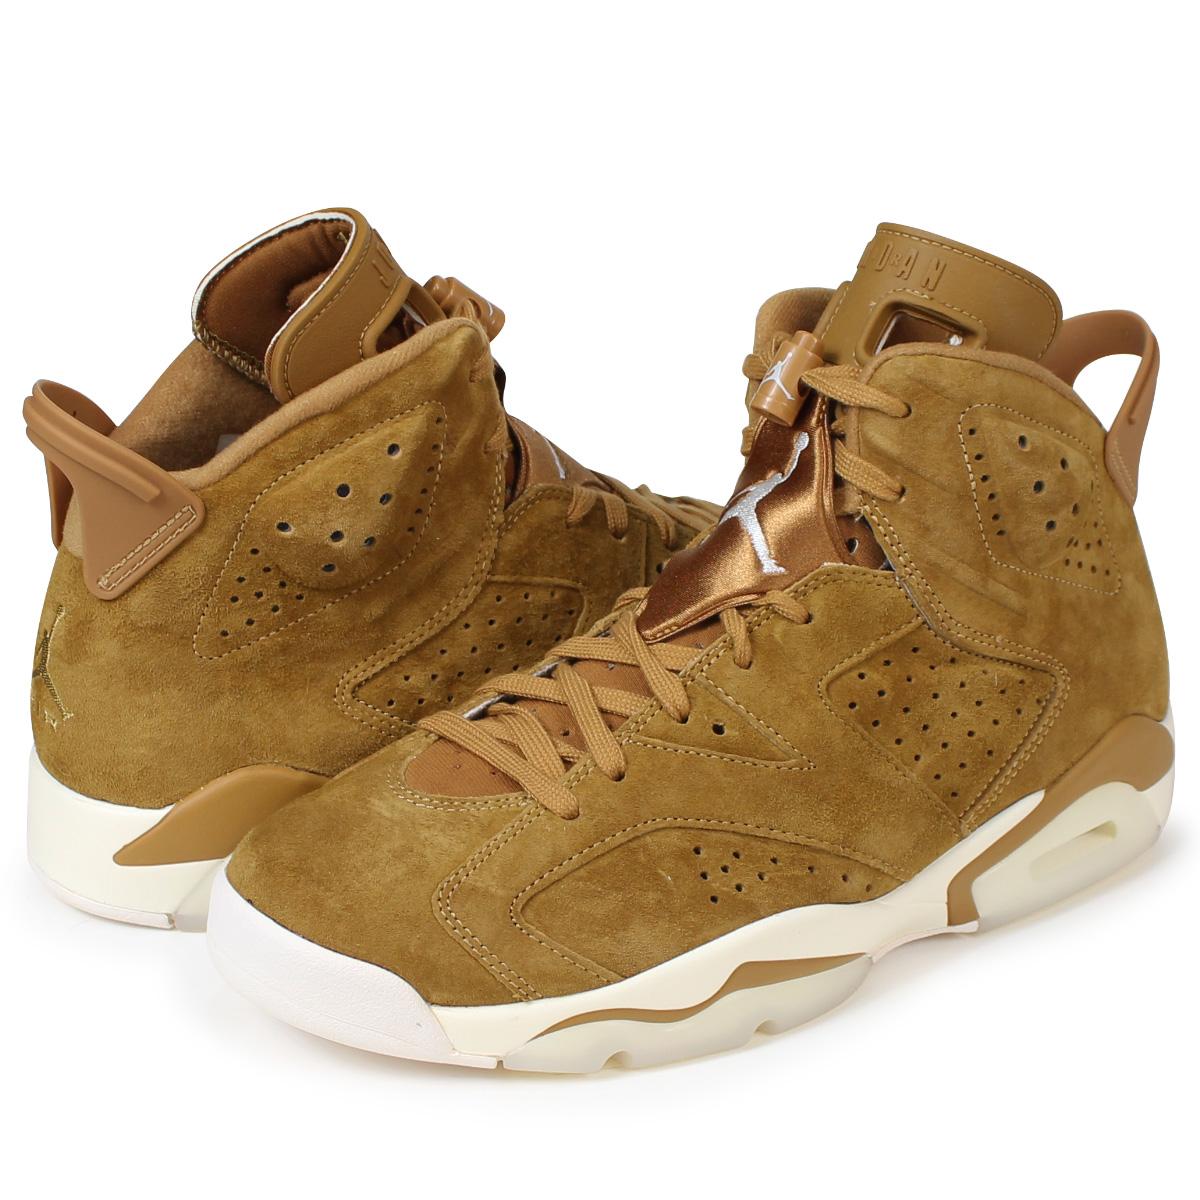 1323a1874b01 ALLSPORTS  NIKE AIR JORDAN 6 RETRO WHEAT Nike Air Jordan 6 nostalgic ...